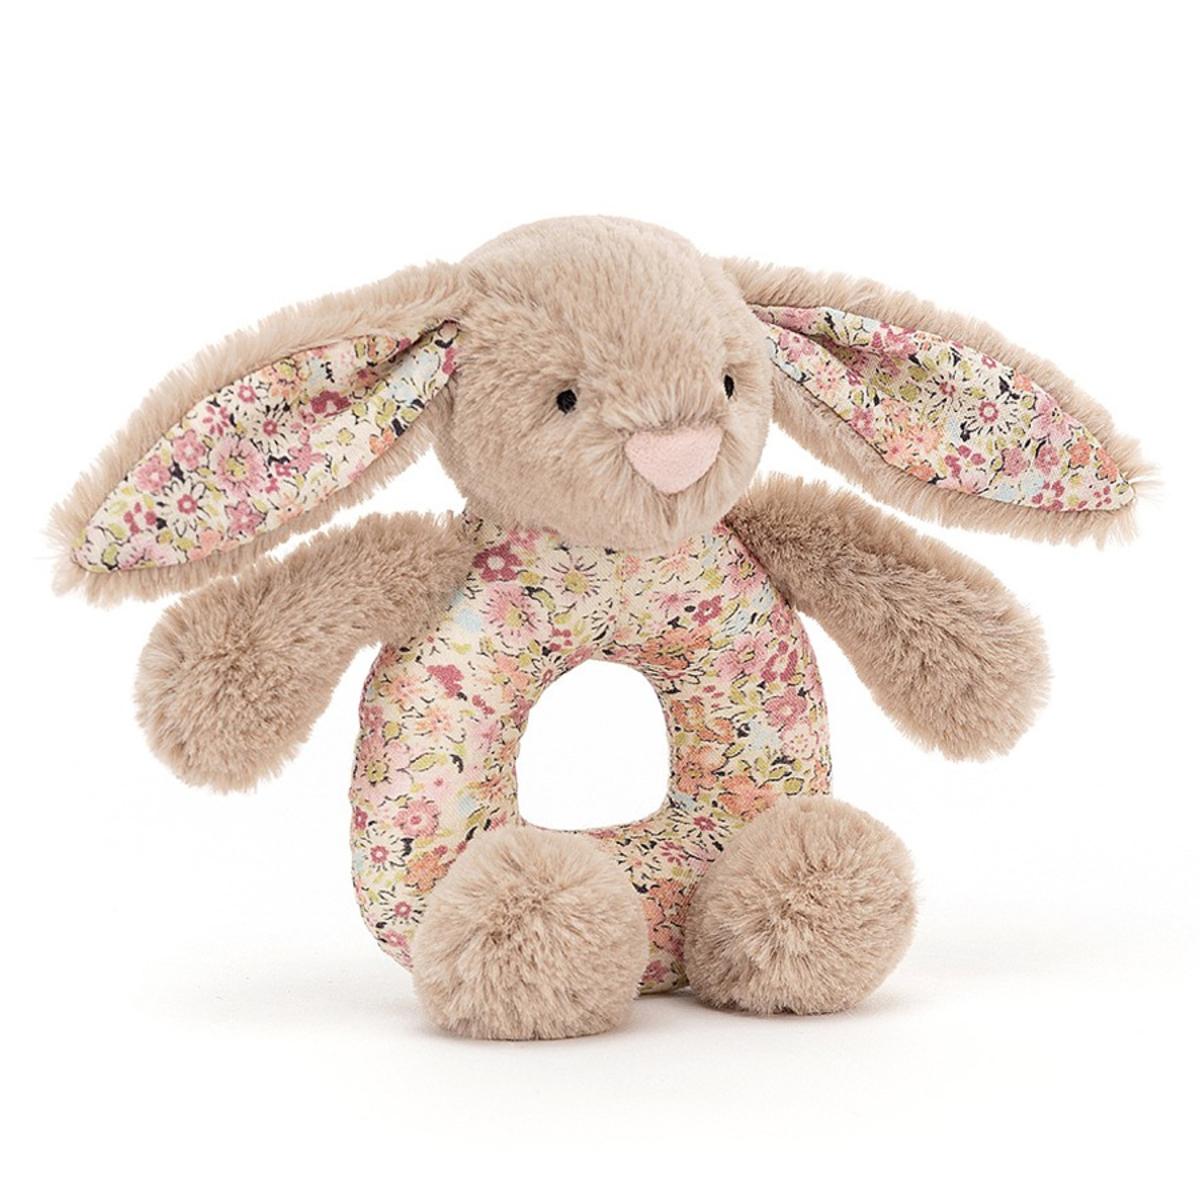 Hochet Hochet Blossom Bea Beige Bunny Hochet Blossom Bea Beige Bunny